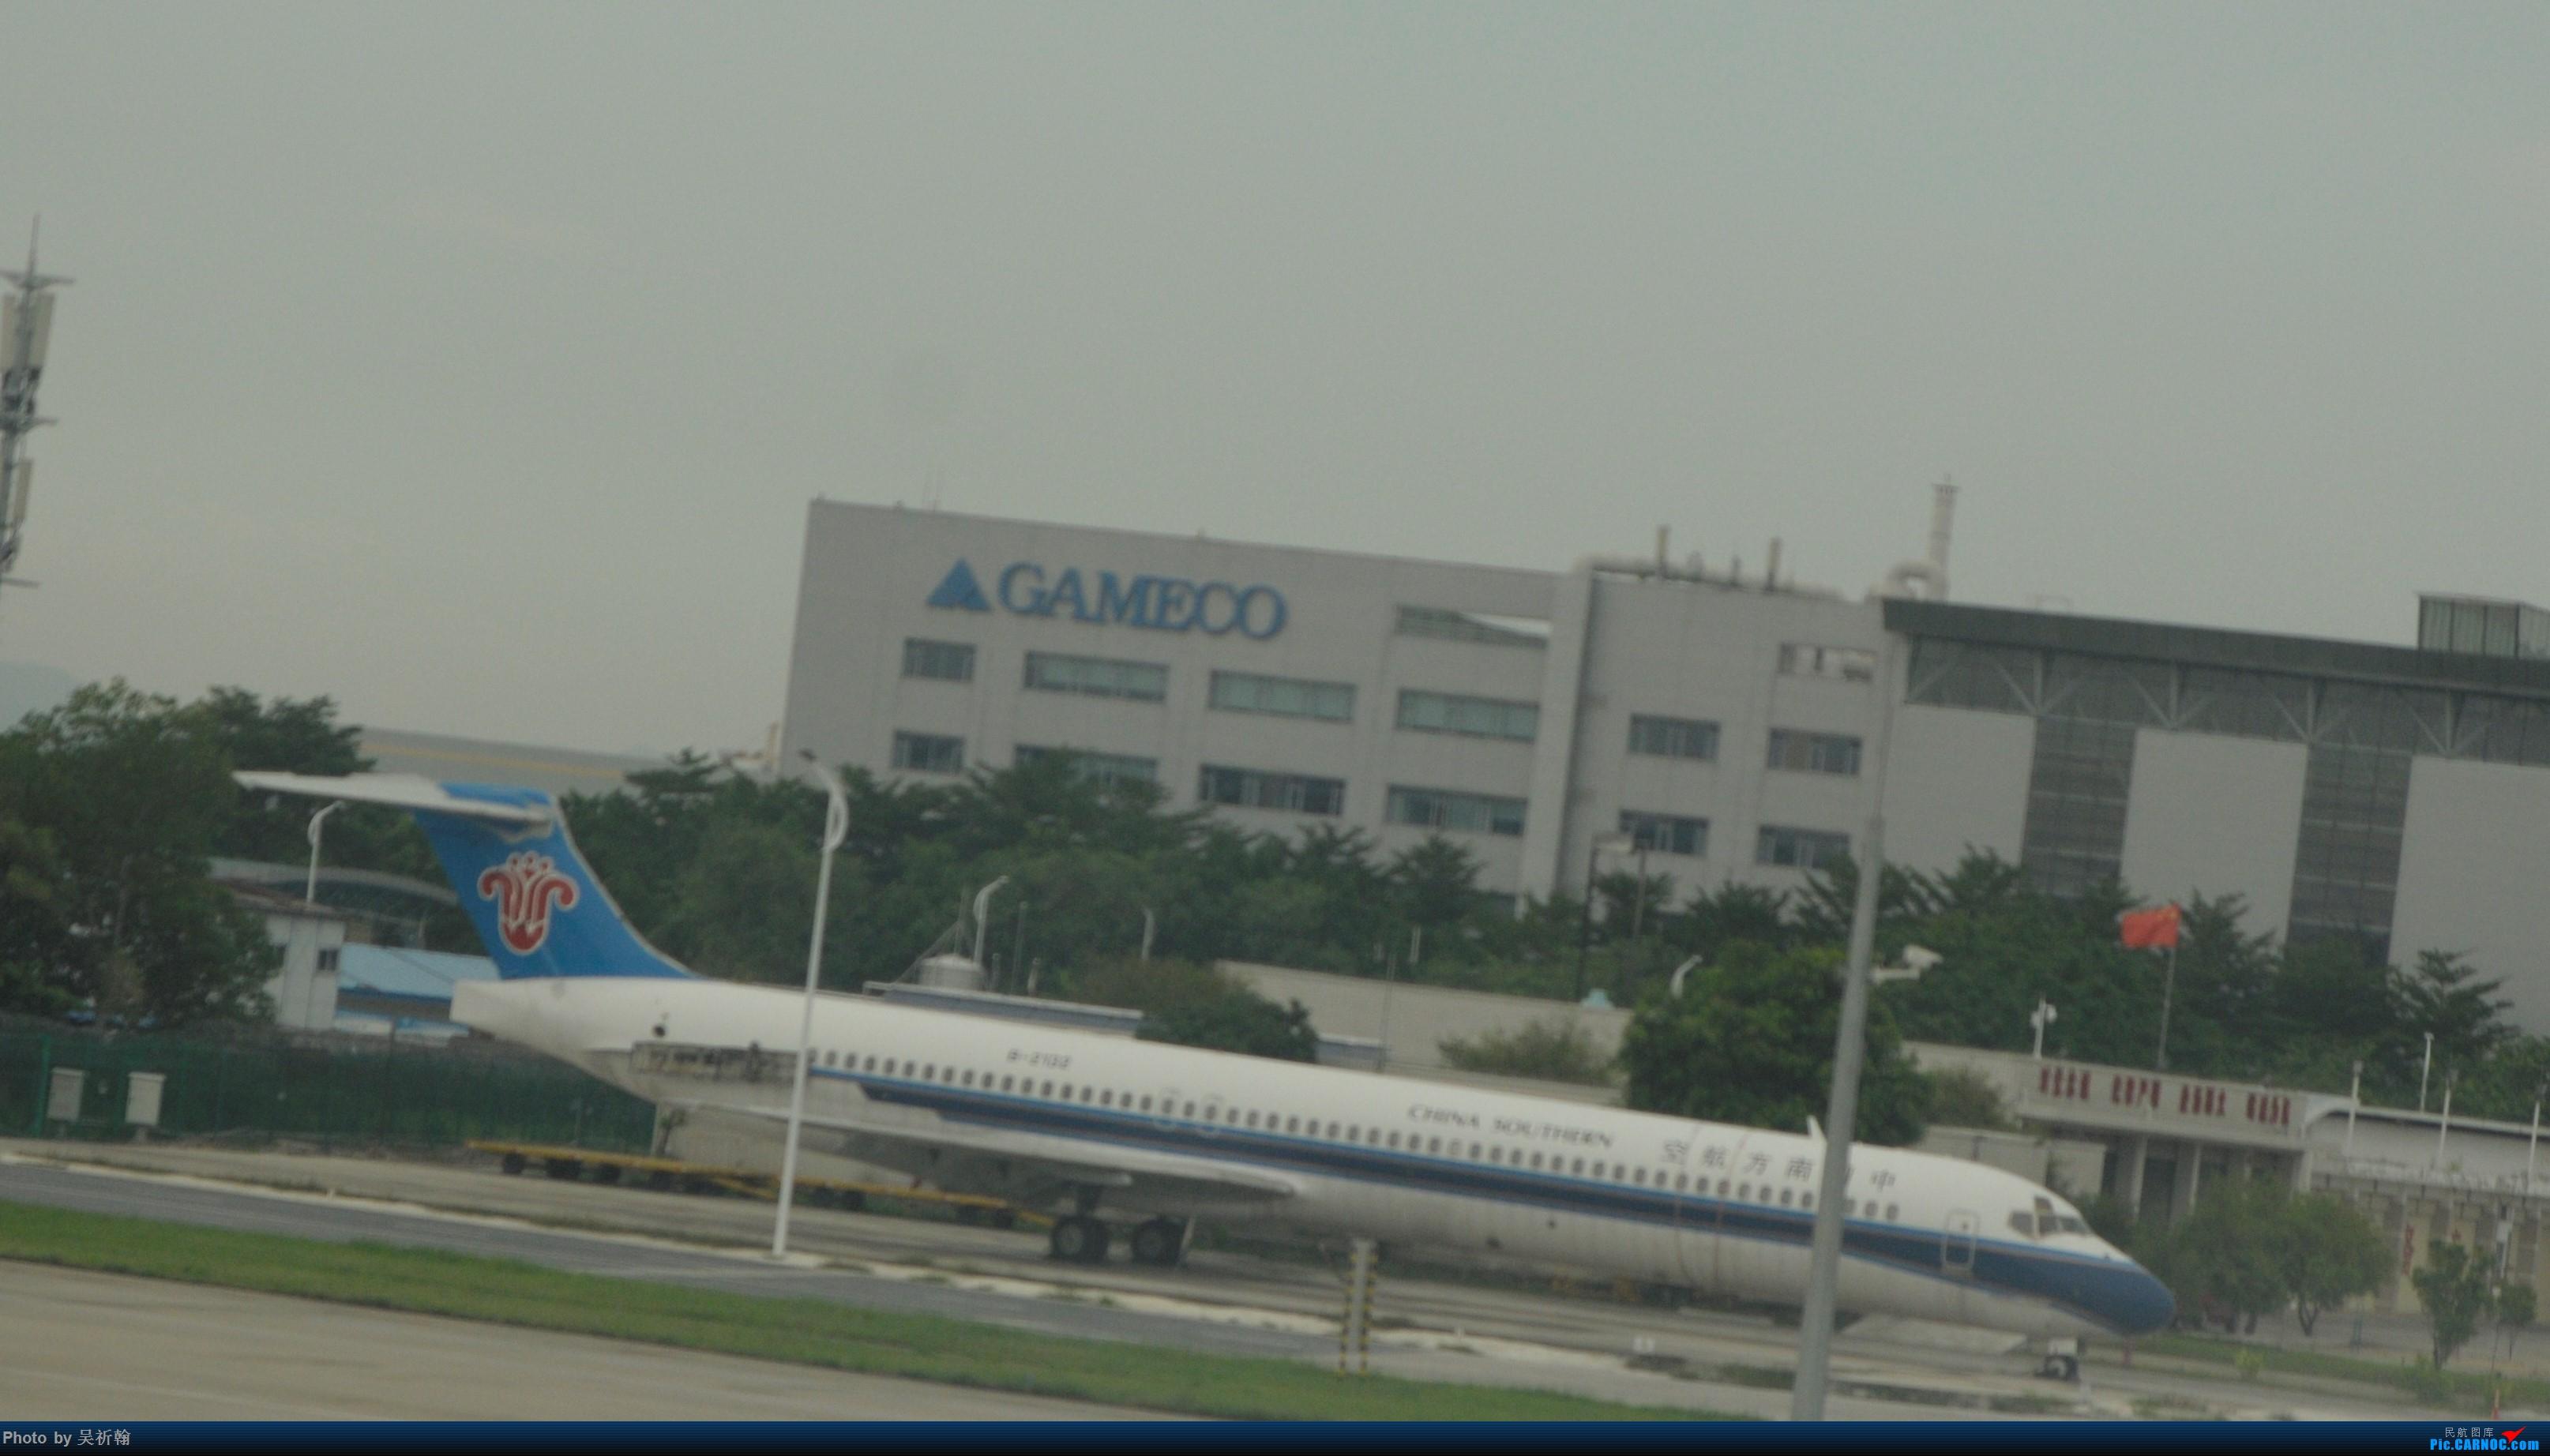 Re:[原创]Kian的飞行游记2:金陵2日游,B787返回广州 MD MD-90